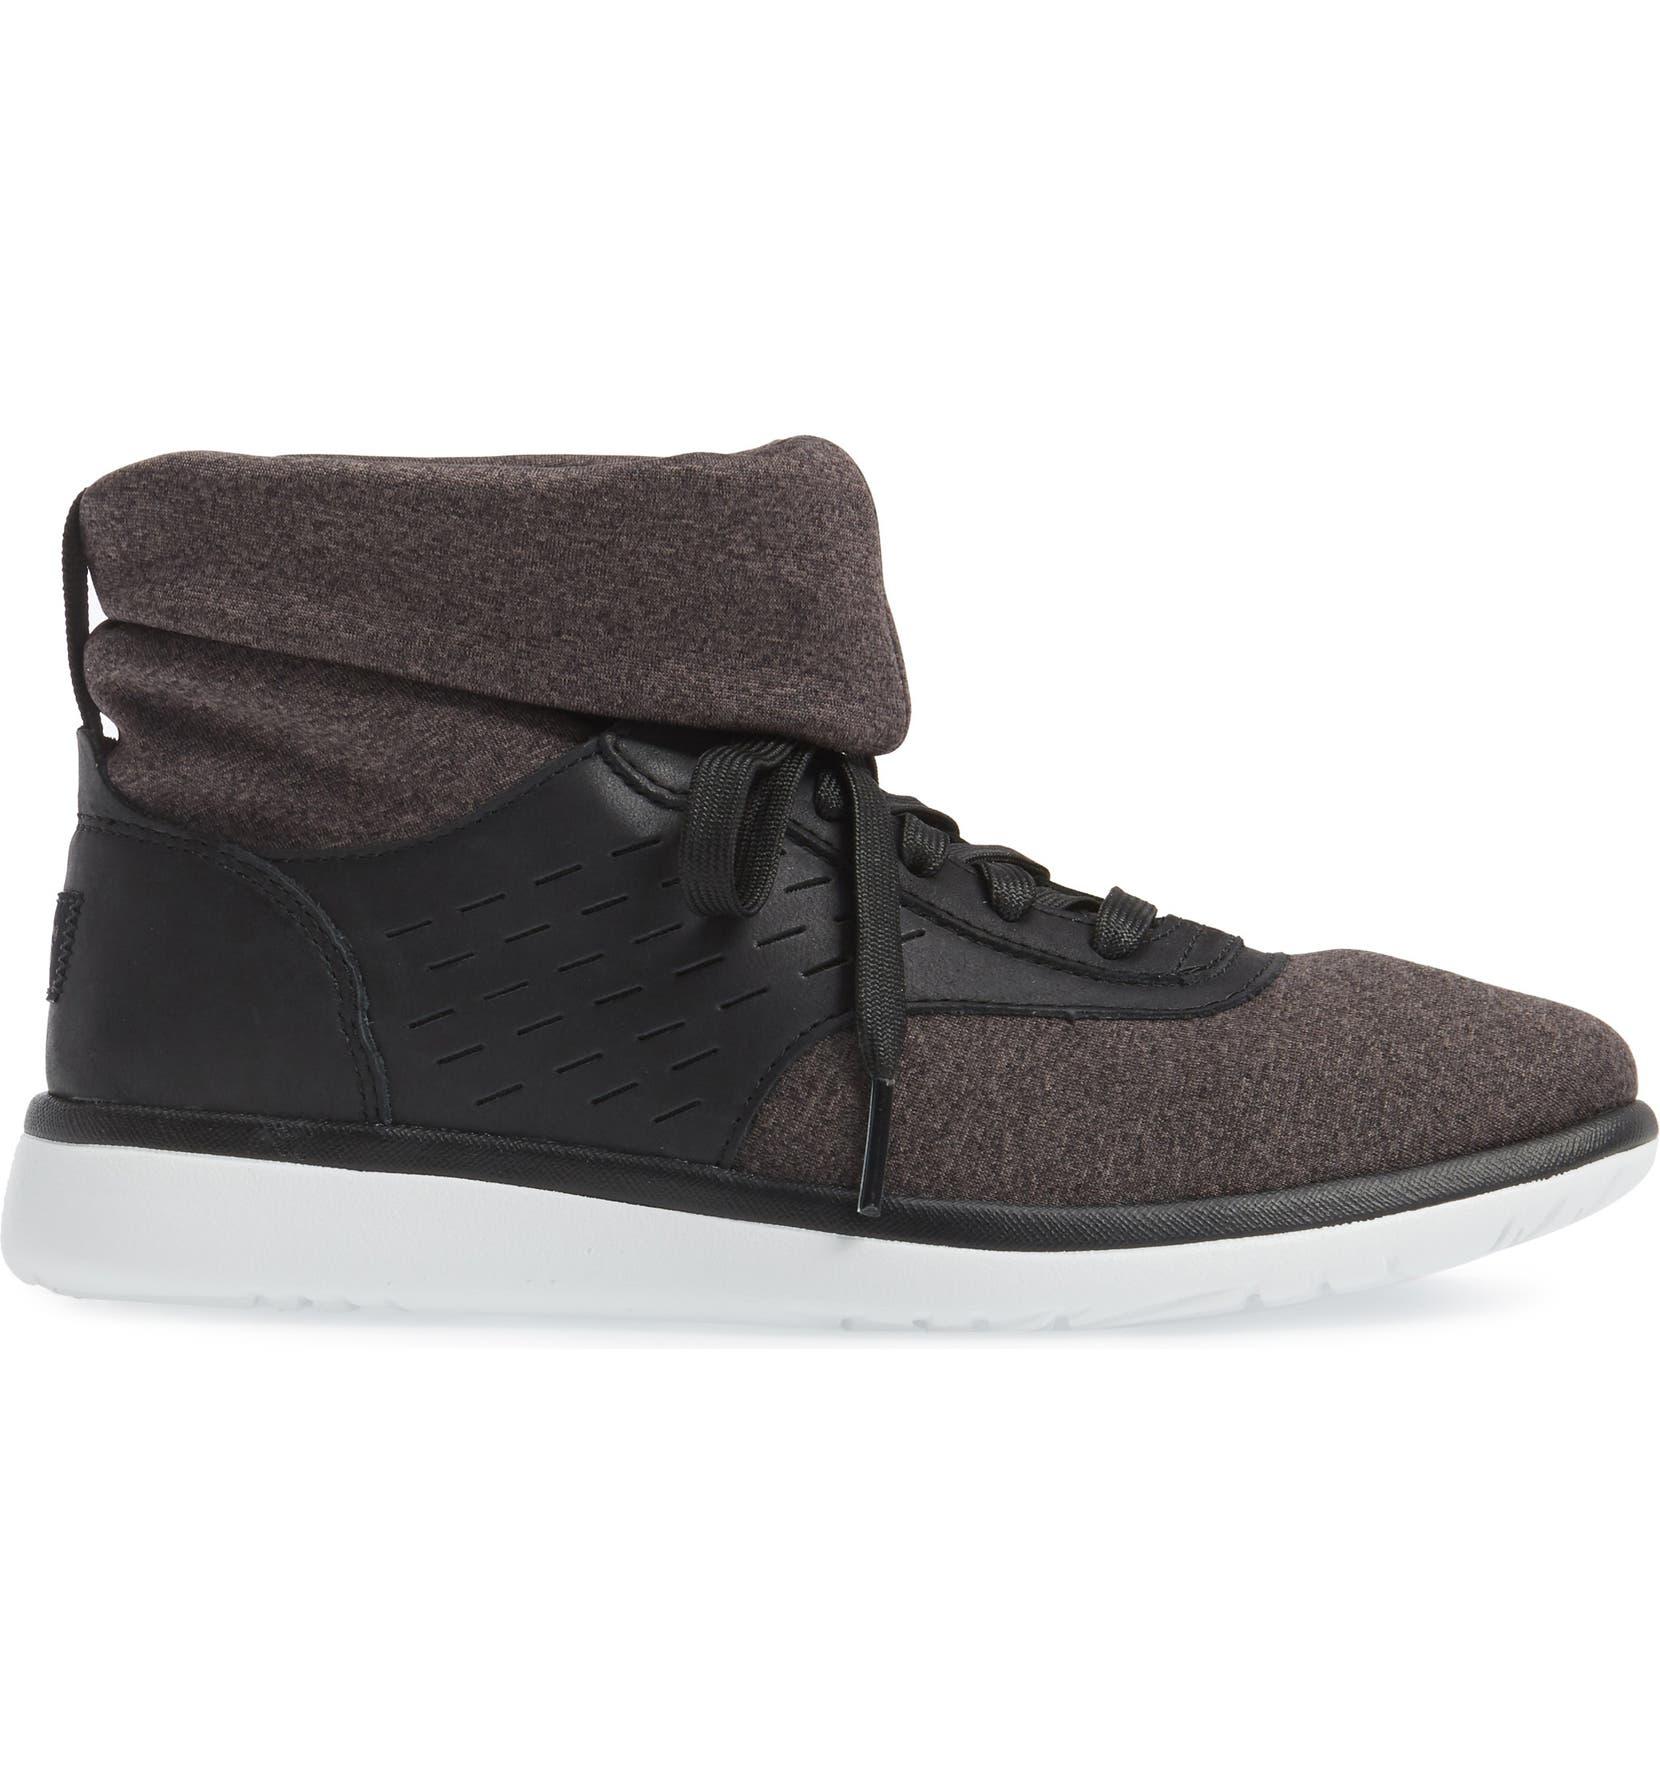 67dfffd1ecf Islay High Top Sneaker